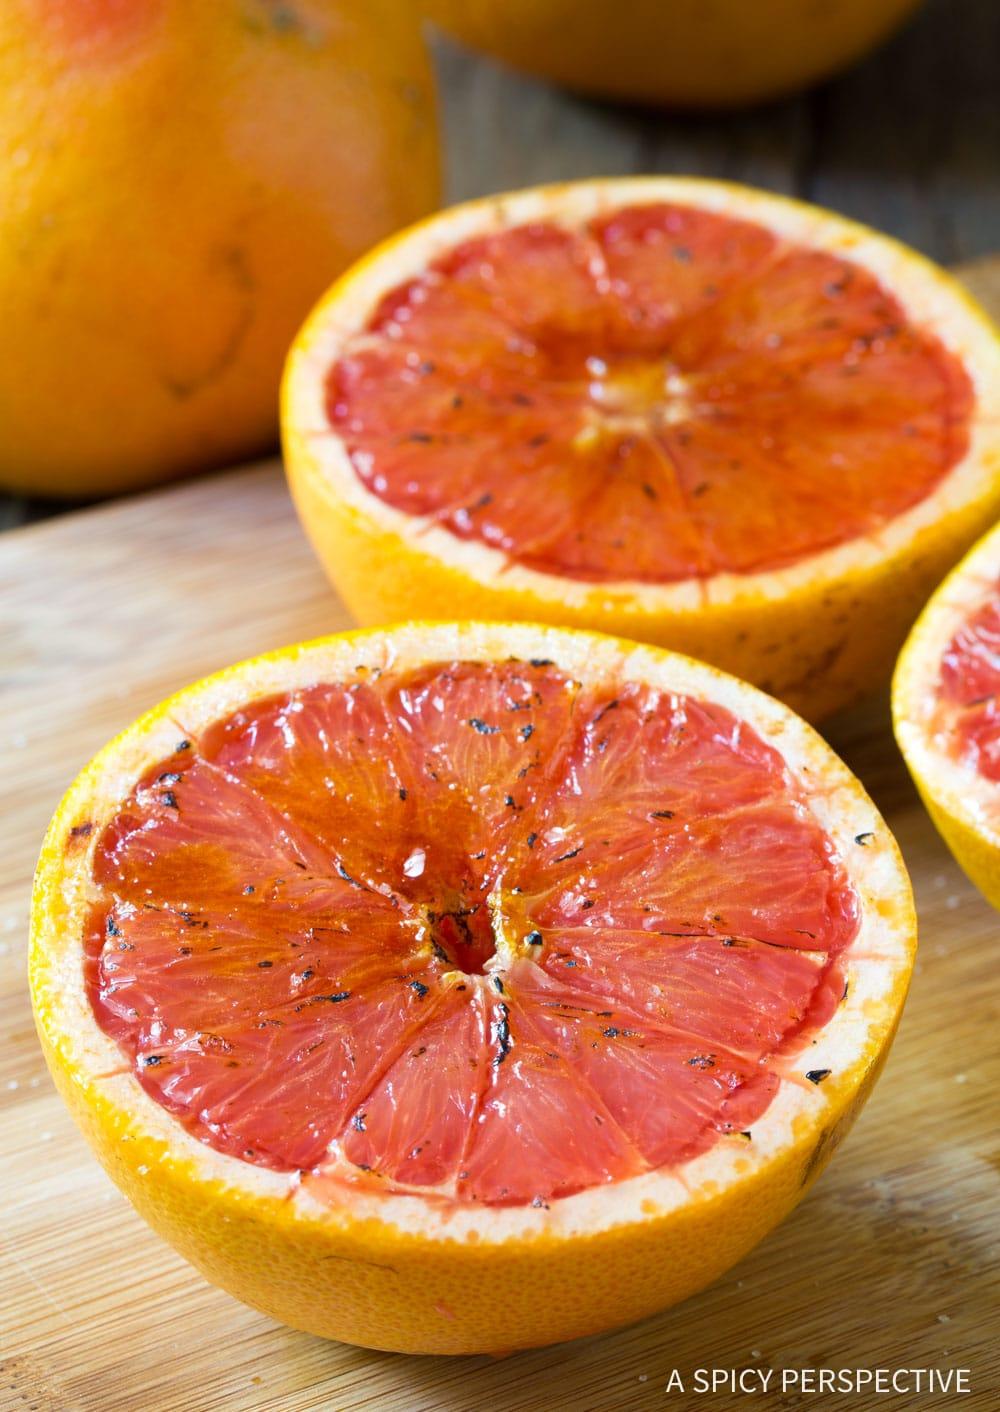 Best Bruleed Grapefruit (Pamplemousse Brûlé) Recipe #ASpicyPerspective #vegan #vegetarian #healthy